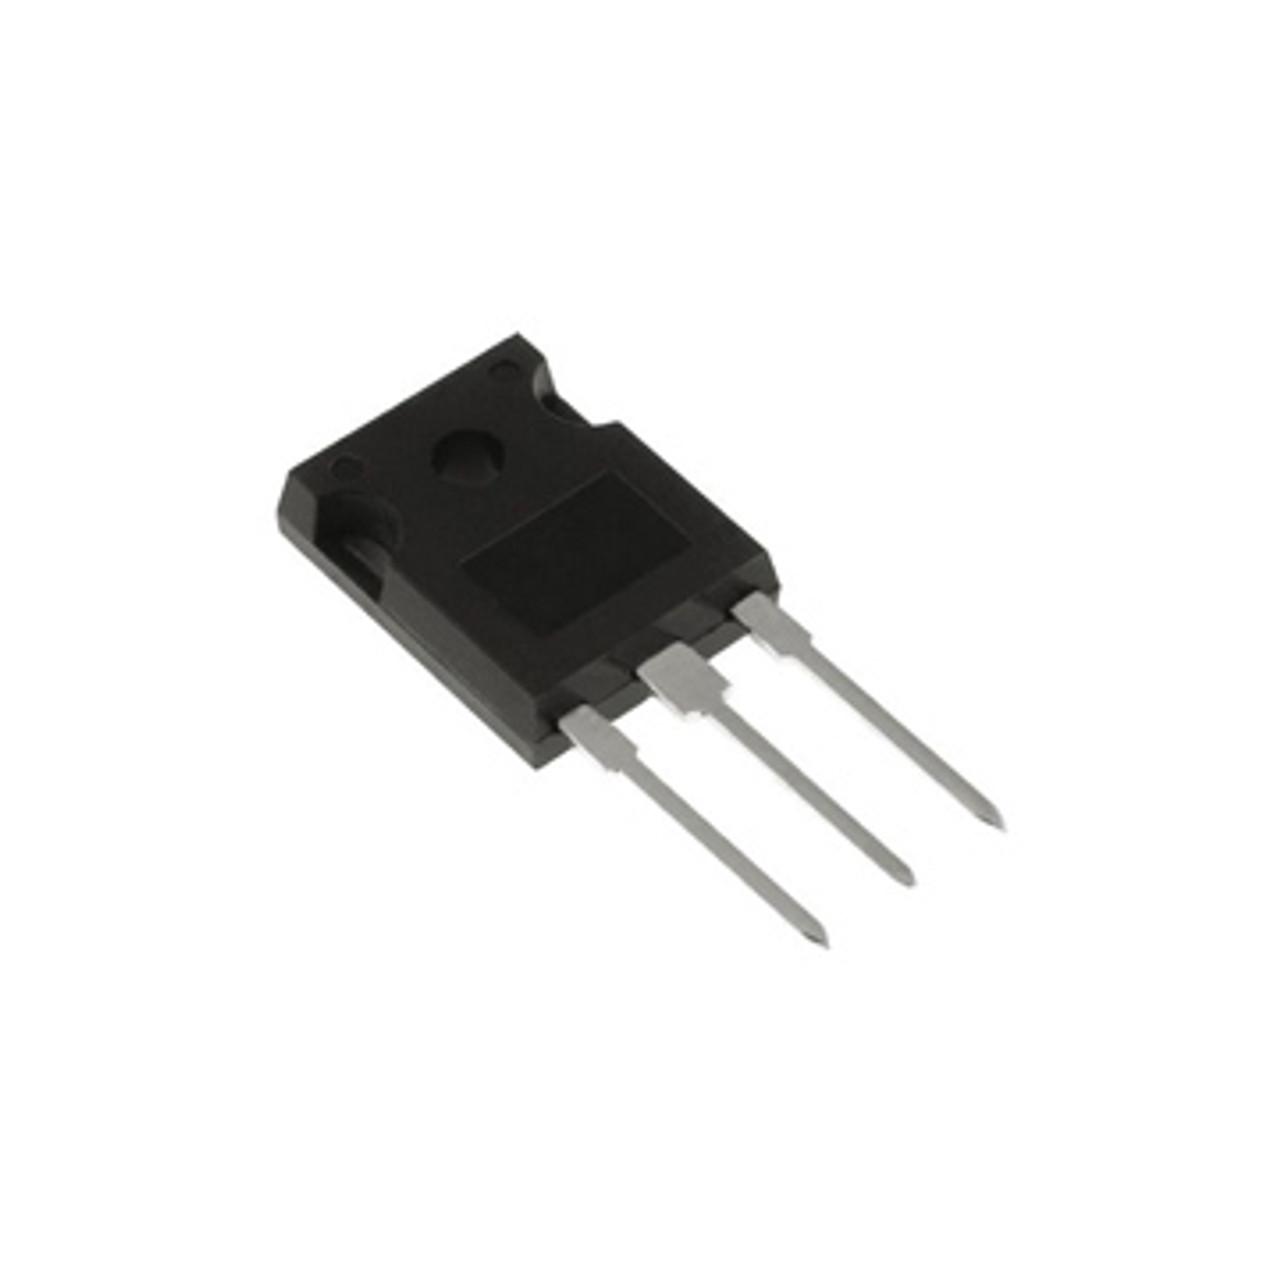 IXFH16N50P MOSFET